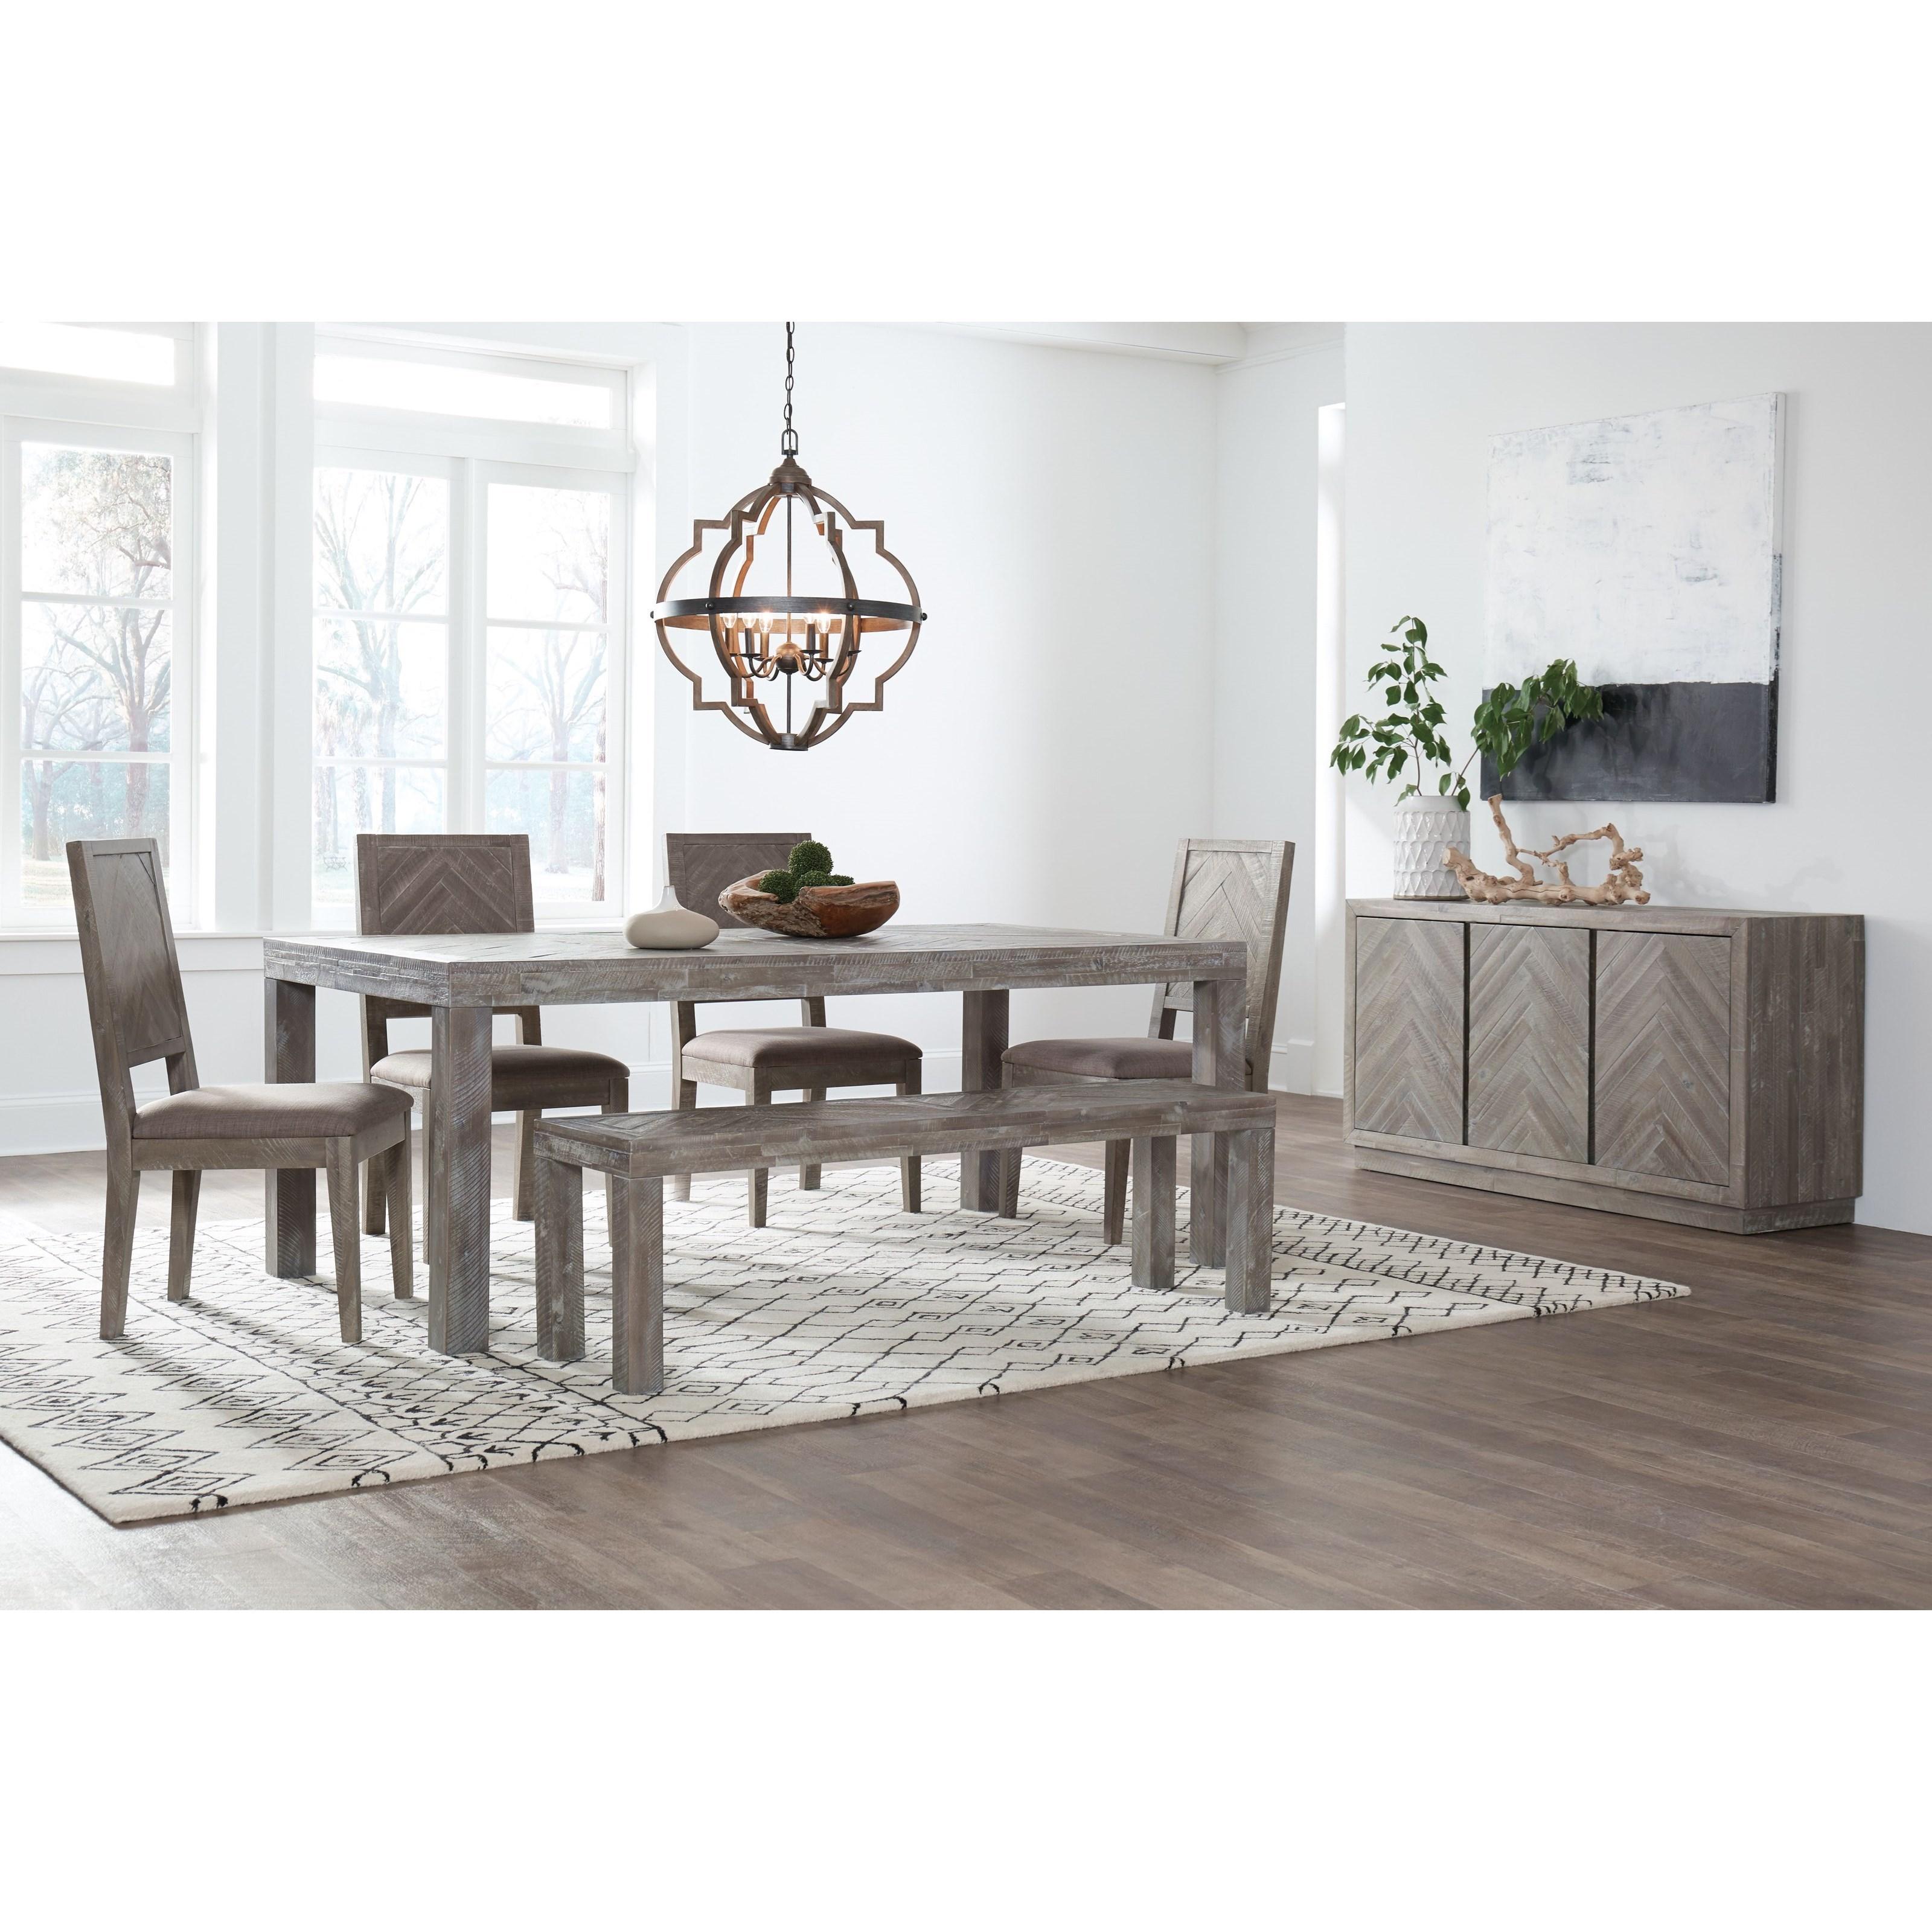 Herringbone Formal Dining Room Group by Modus International at Del Sol Furniture